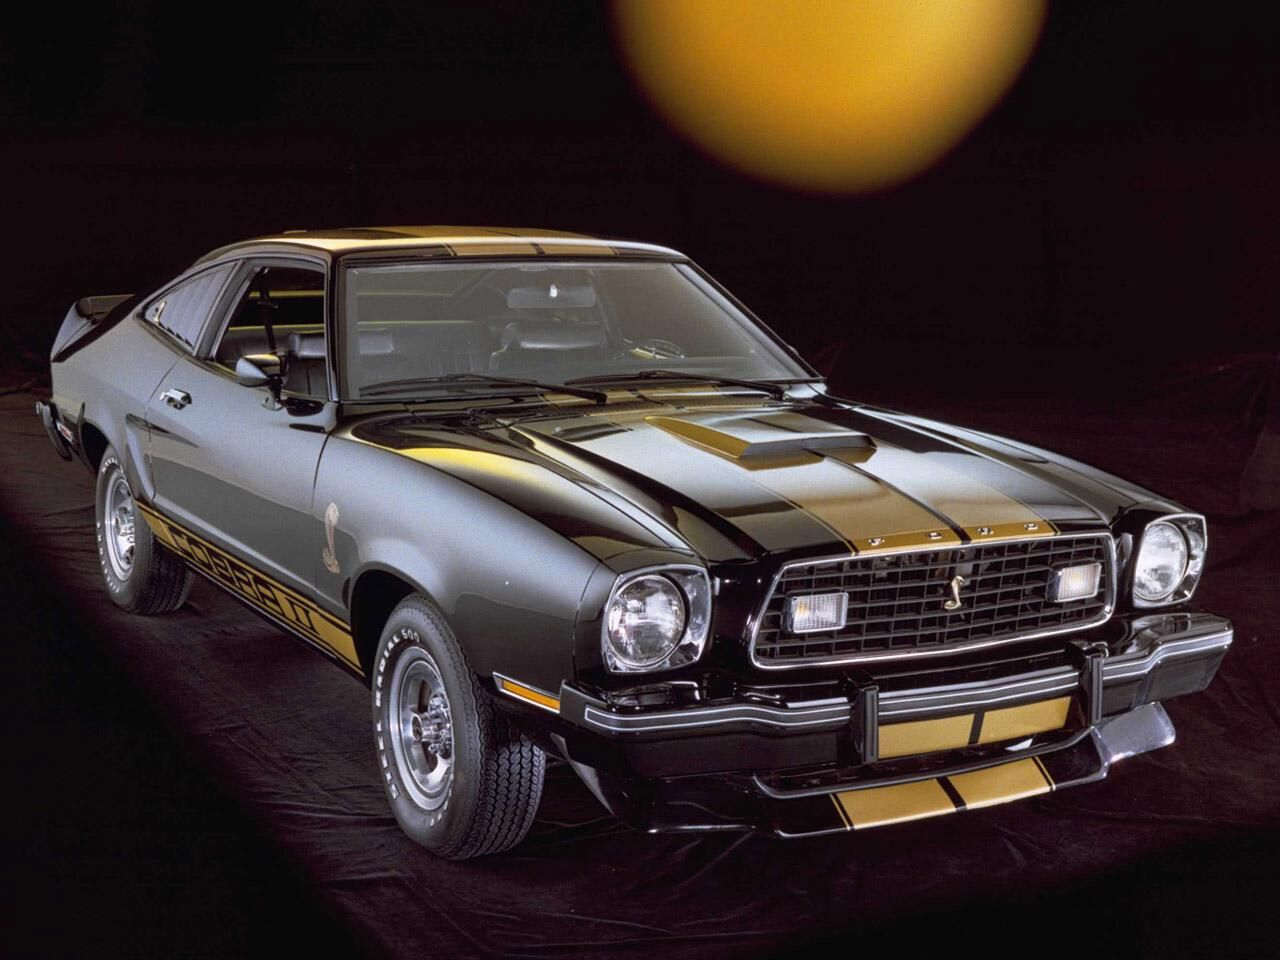 1975 ford mustang cobra ii hemmings of the day 1977 ford 1975 ford mustang cobra ii hemmings of the day 1977 ford mustang ii cobra